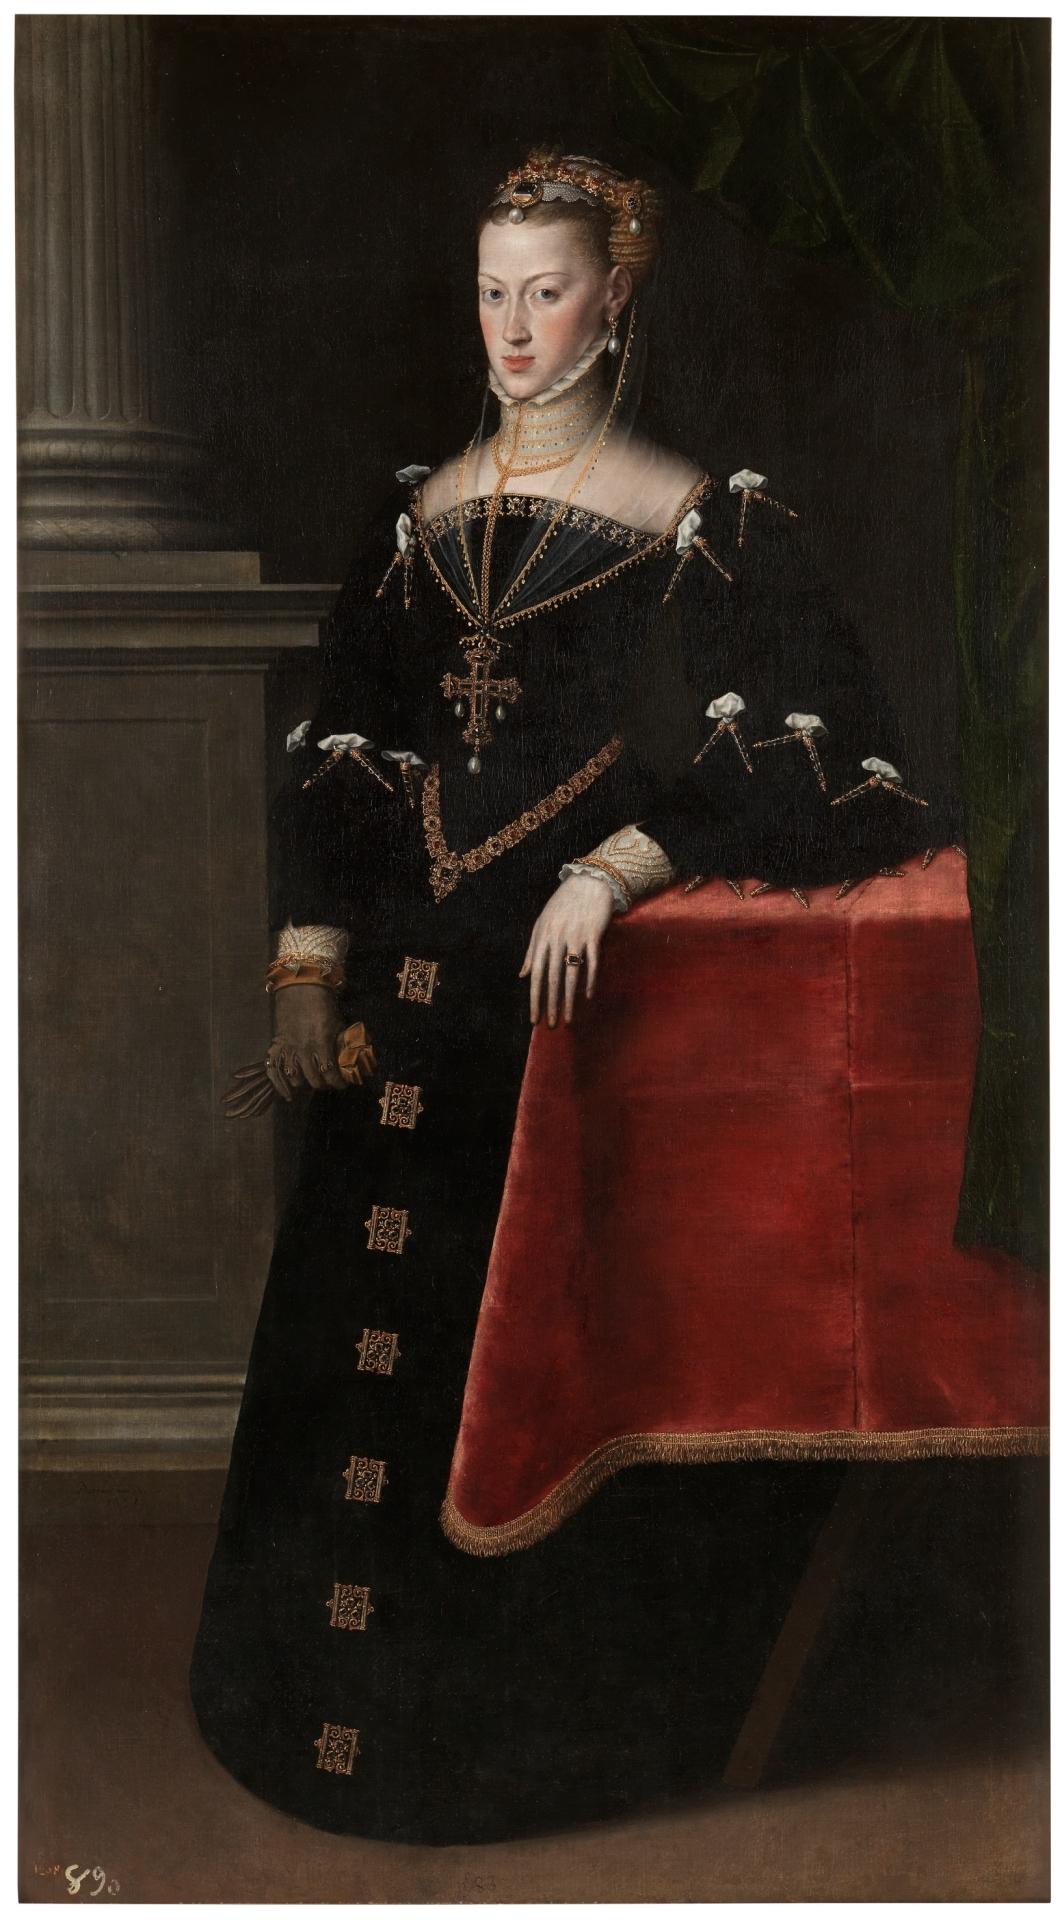 Empress Maria of Austria, Wife of Maximilian II - The Collection - Museo  Nacional del Prado